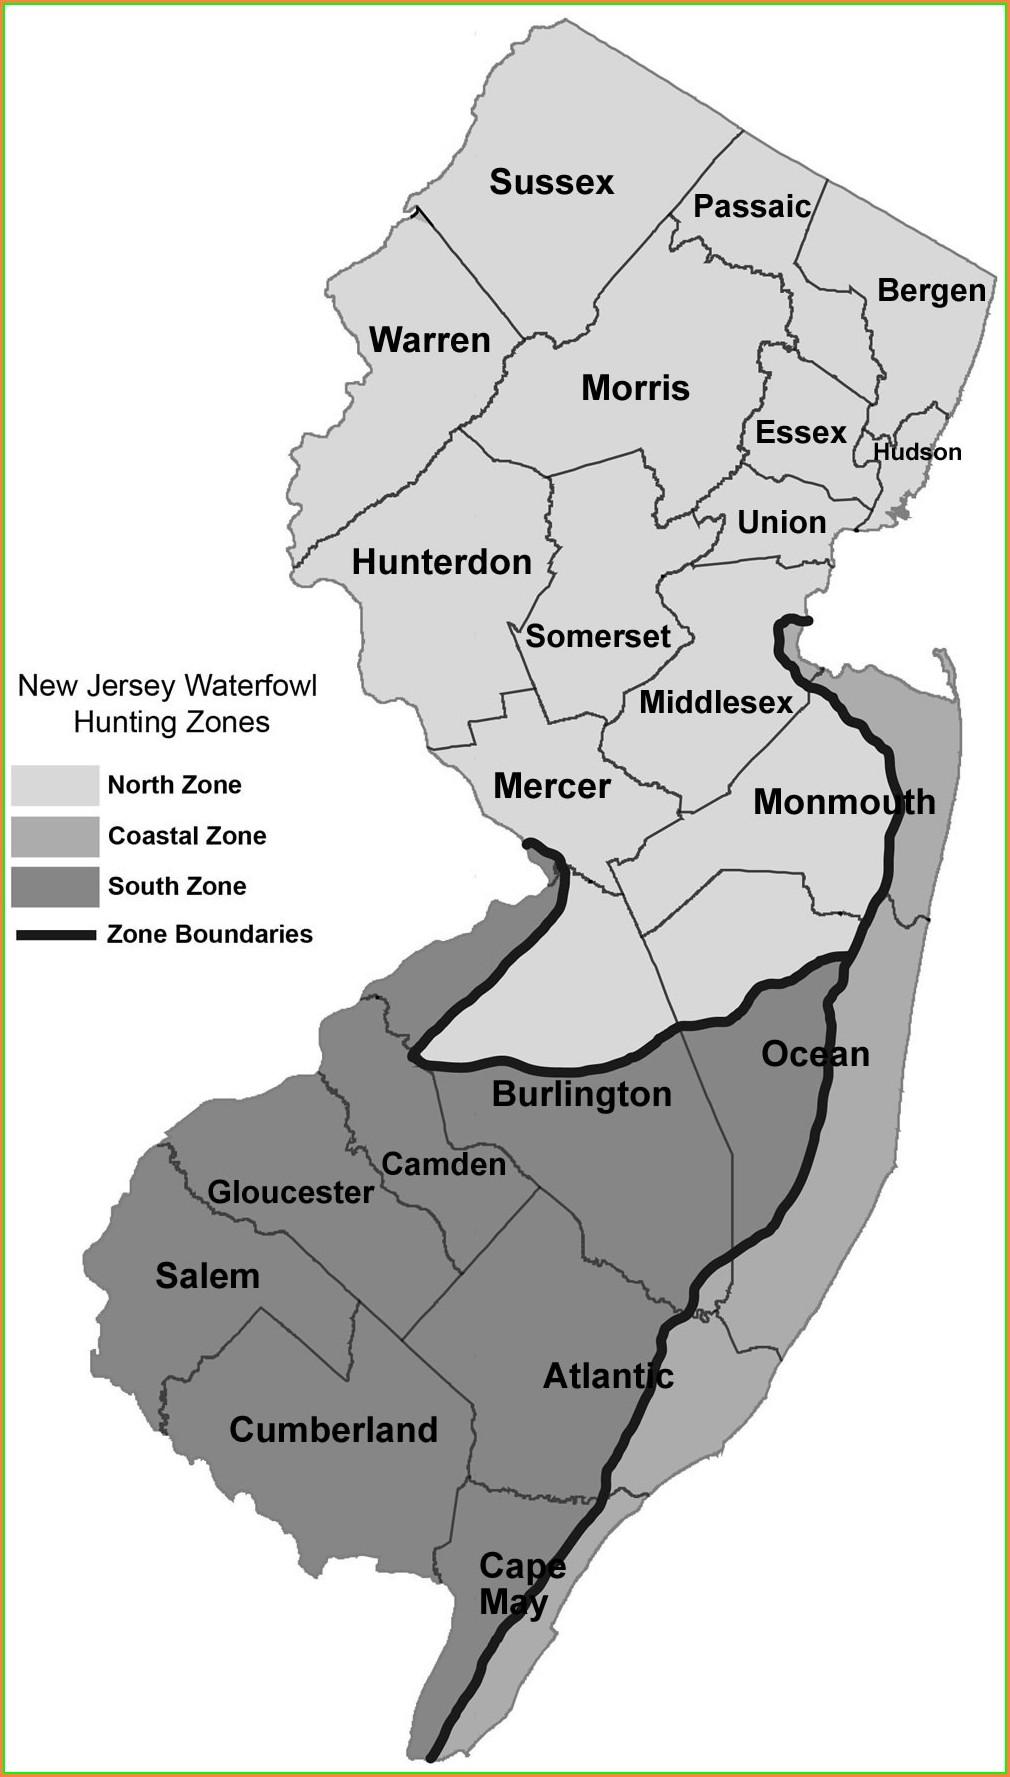 Nj Hunting Zone Map 2019